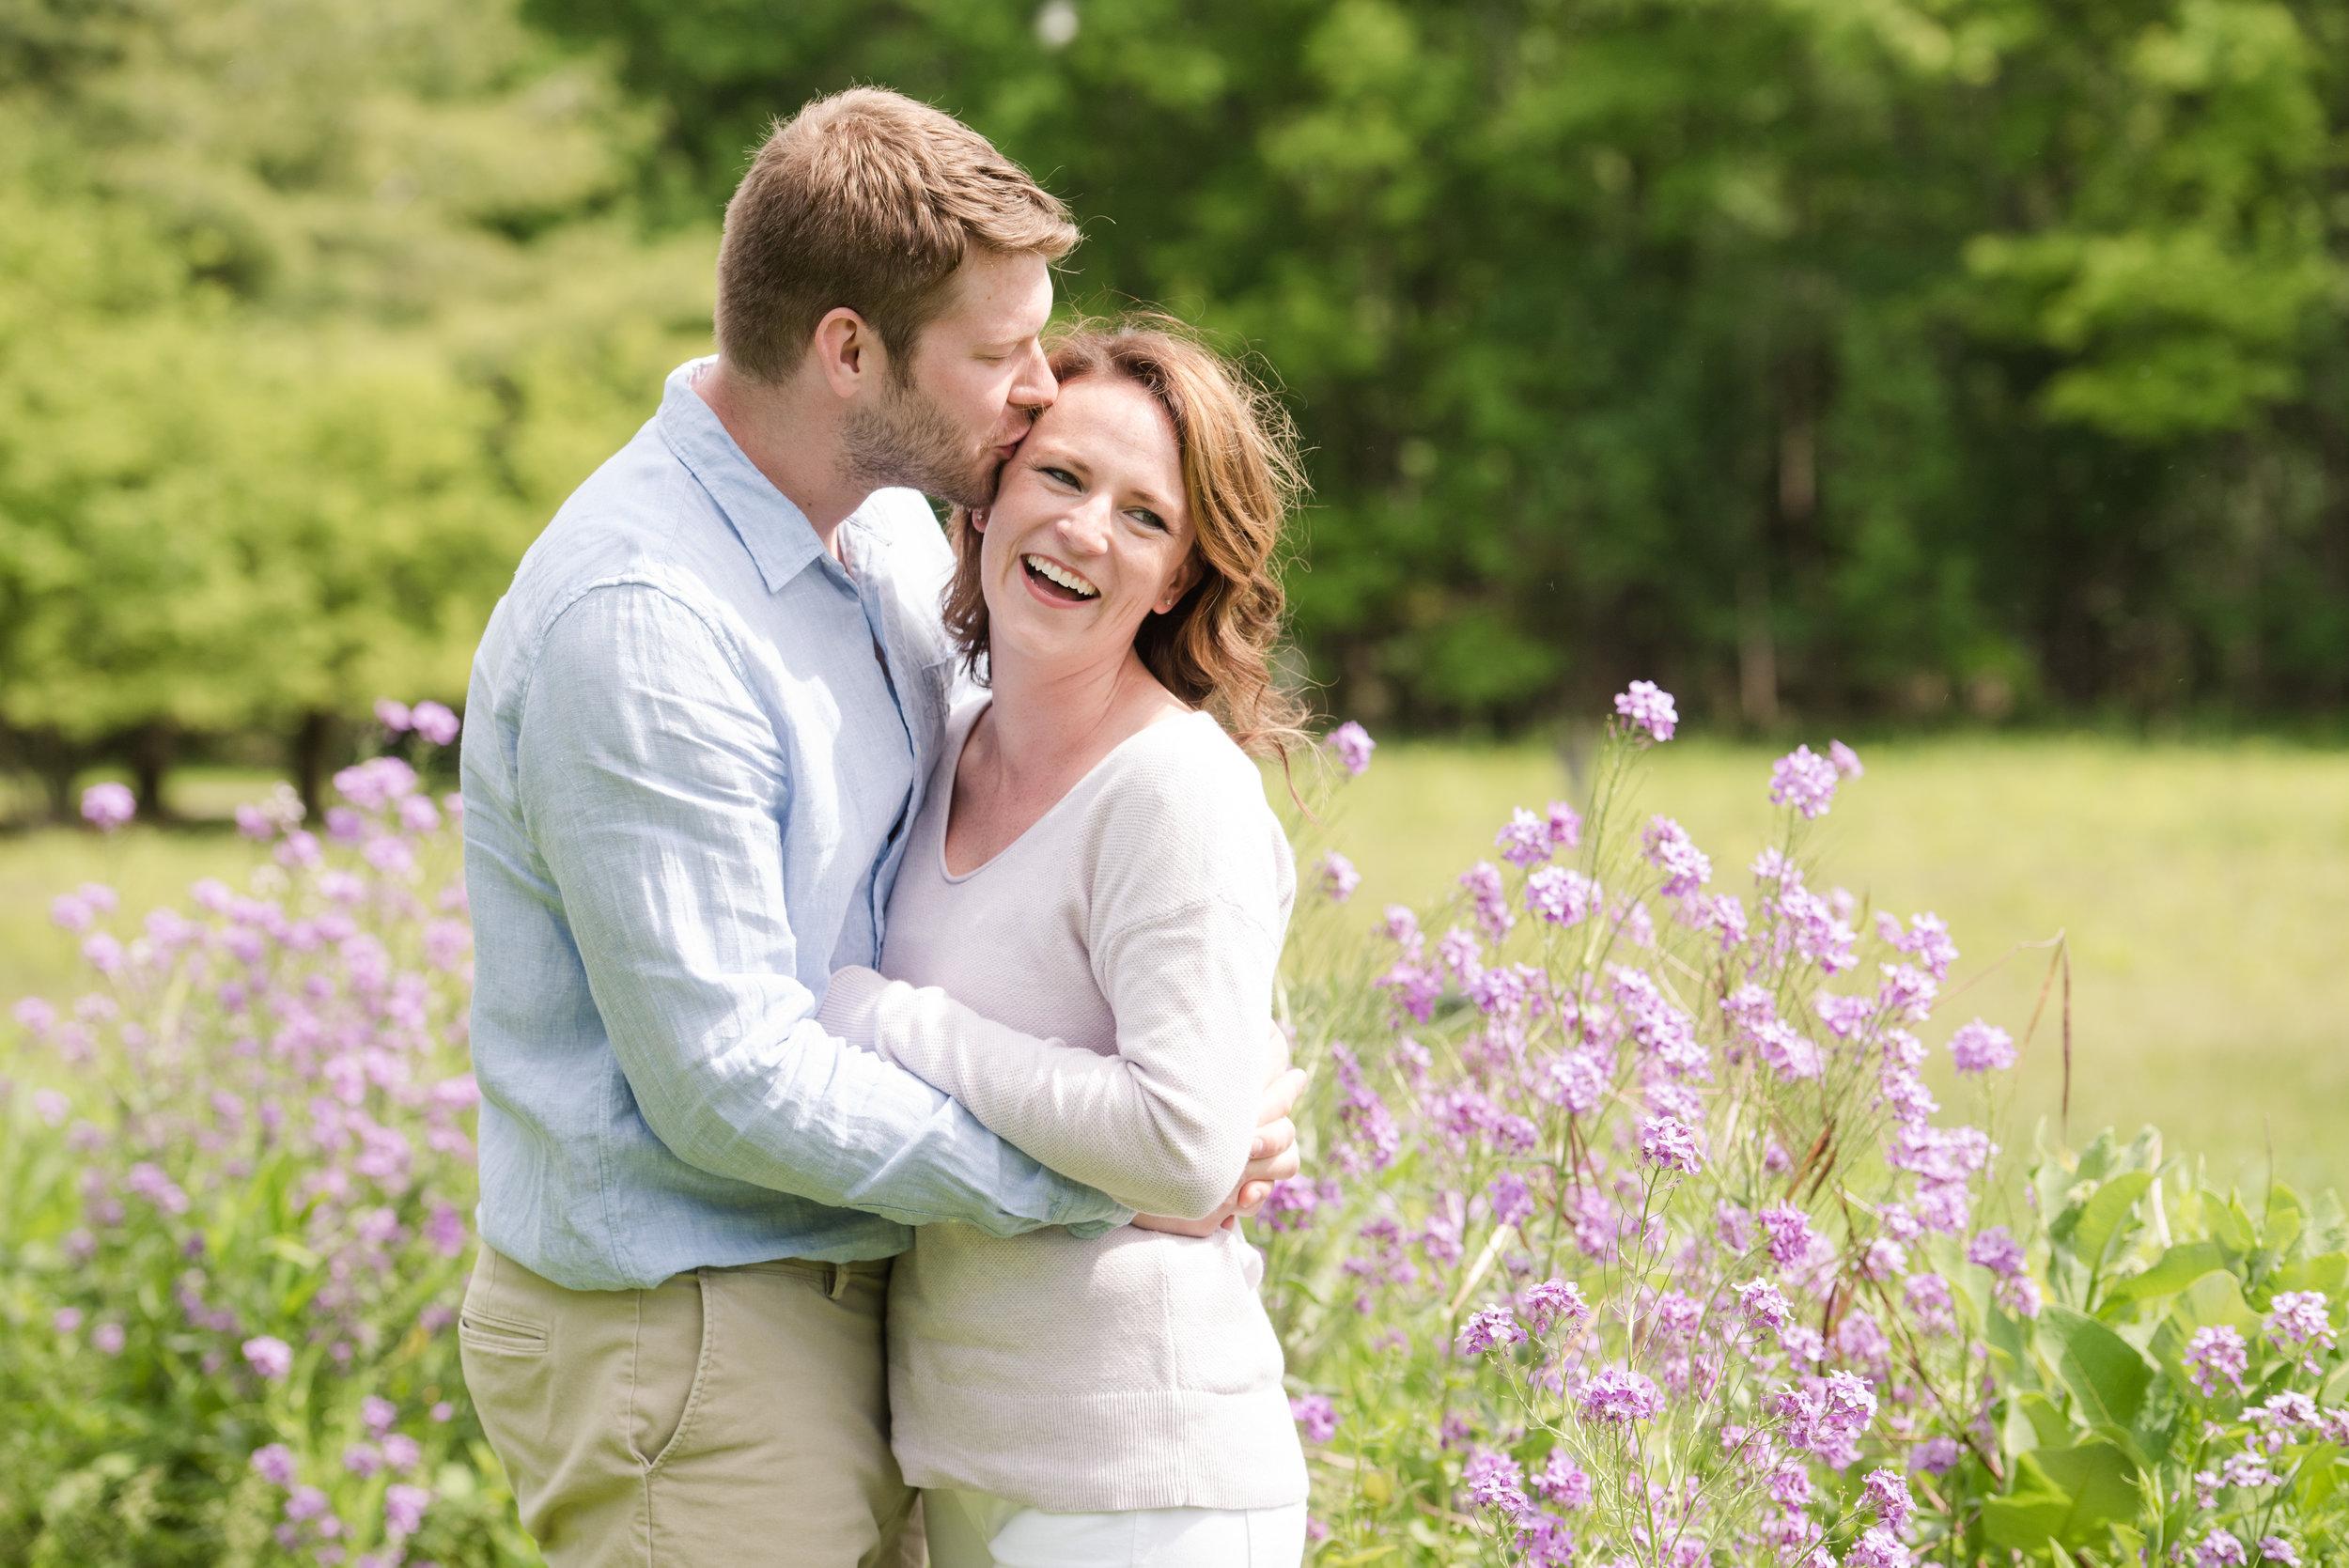 GALLERY-2019-6-9 Kaitlin, Justin & Liam Engagement 0285 19.jpg